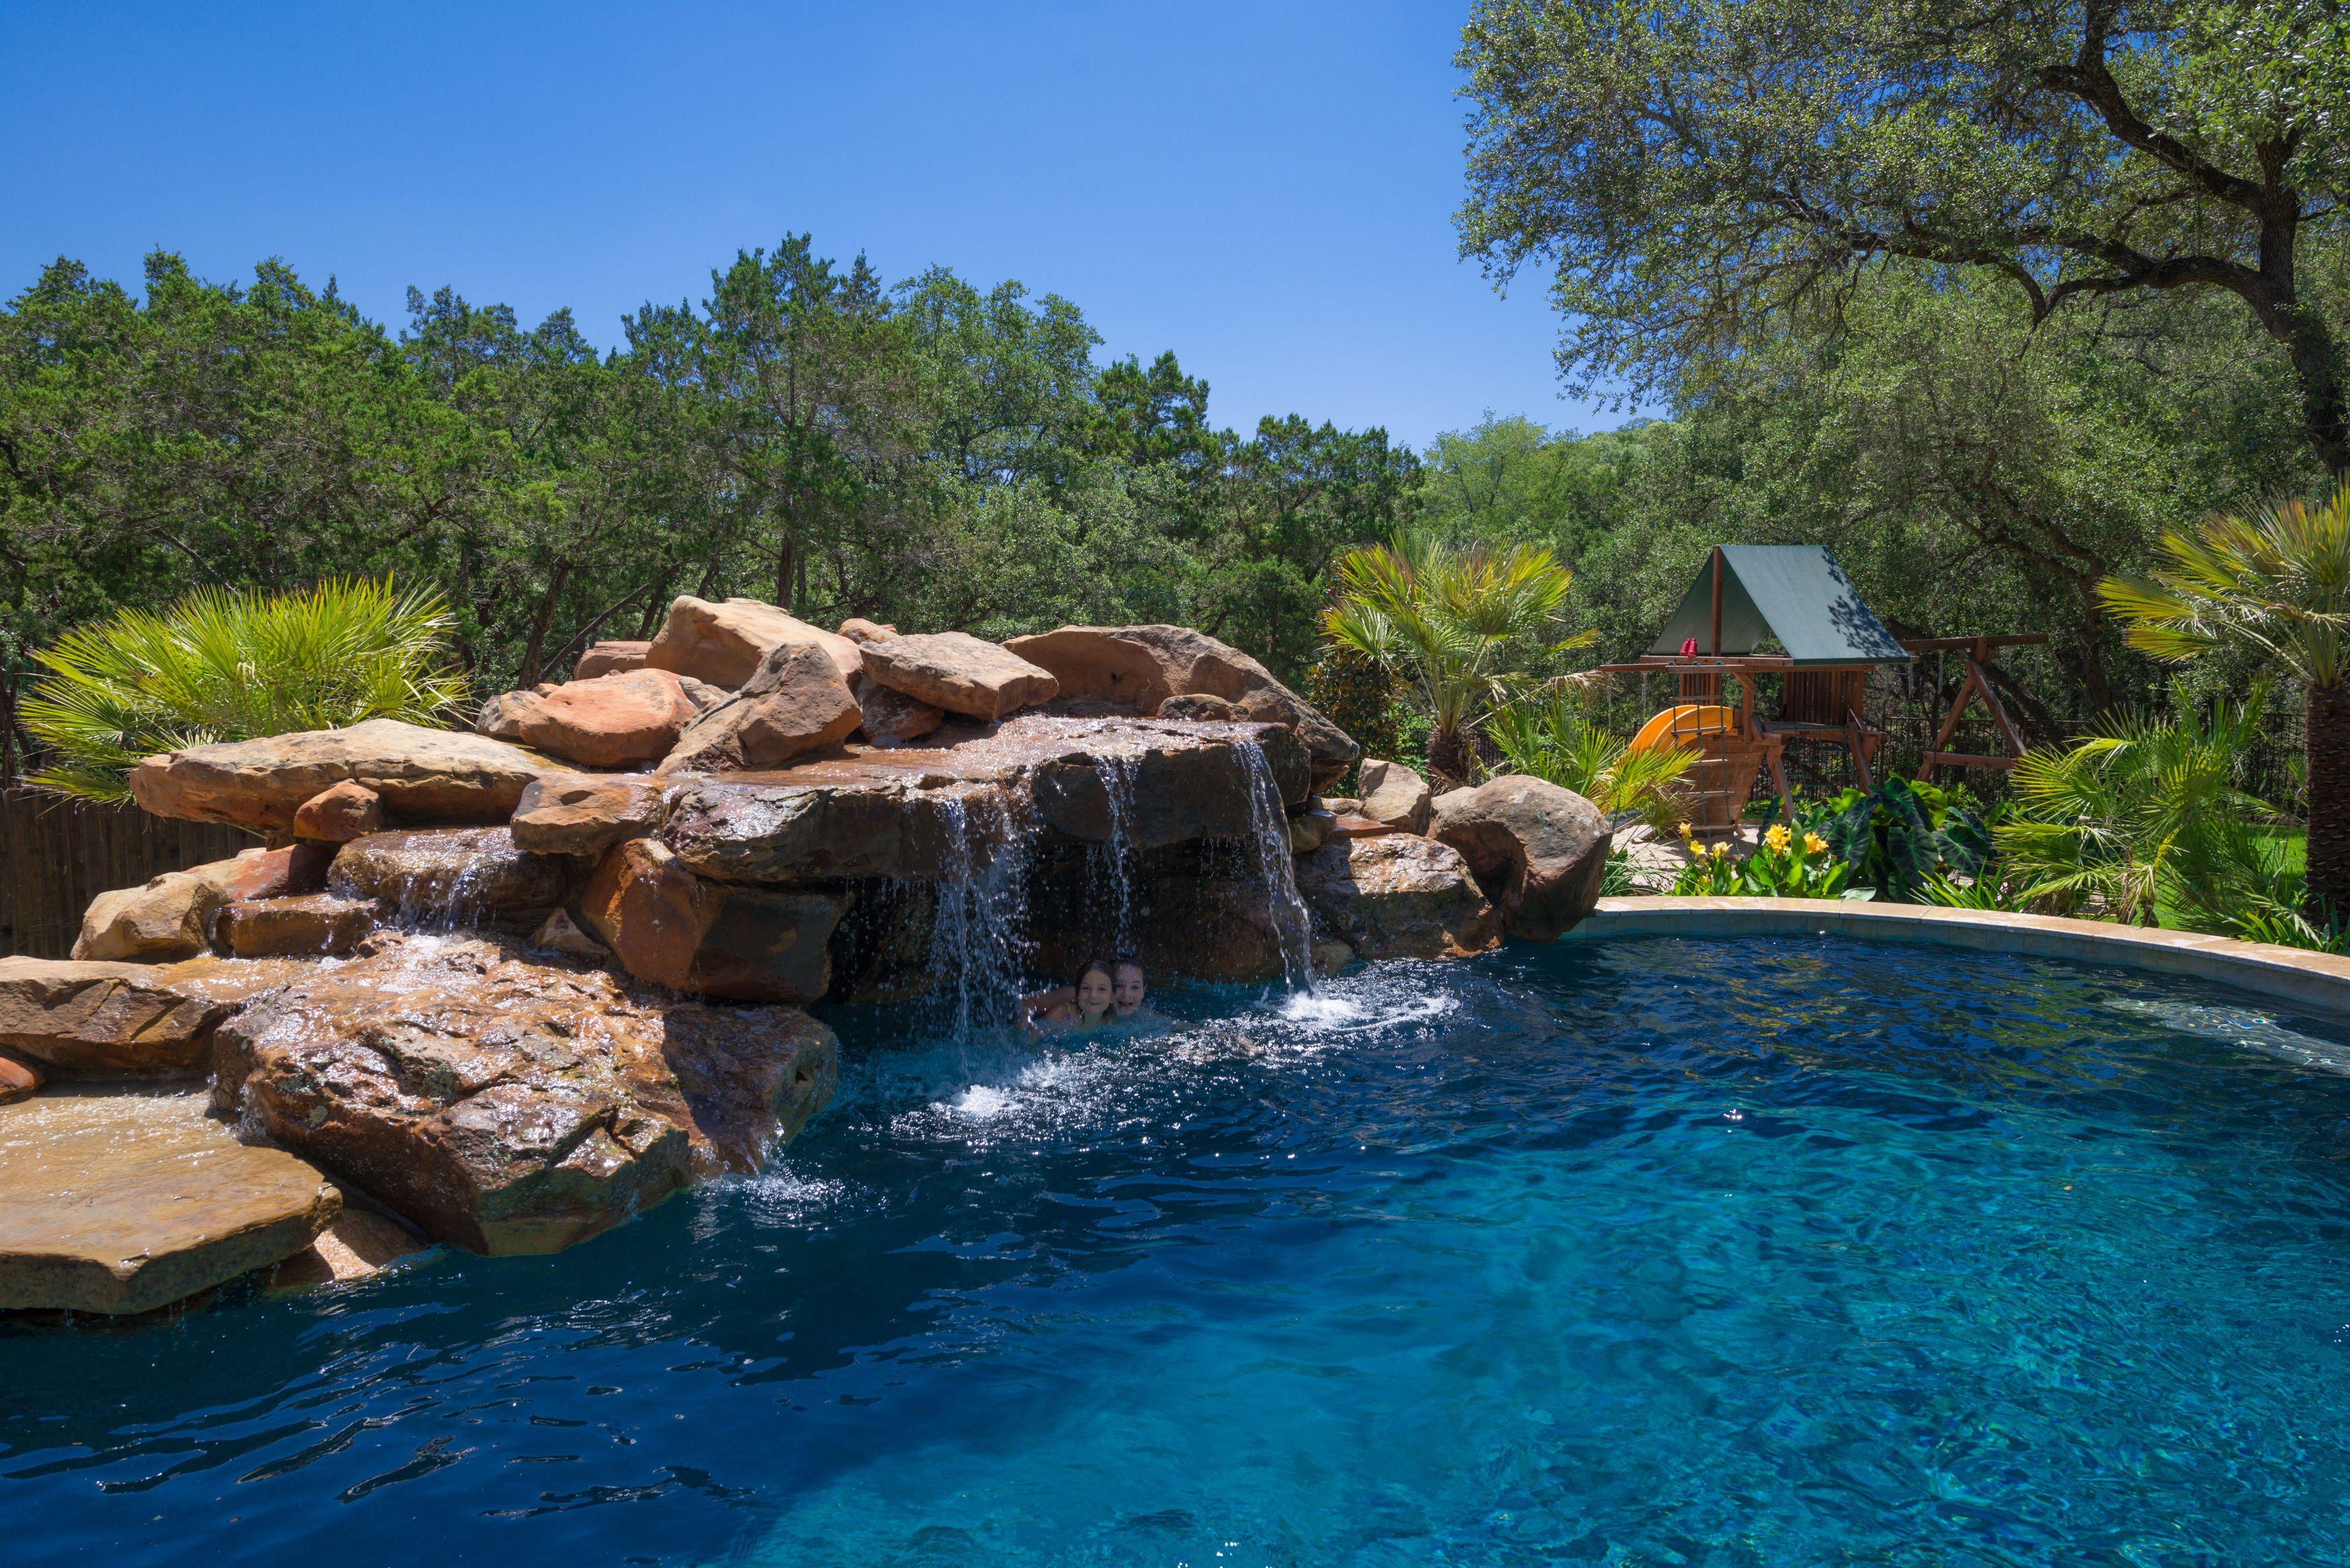 Real Rock Waterfall And Grotto Pool Waterfall Rock Waterfall Pool Designs